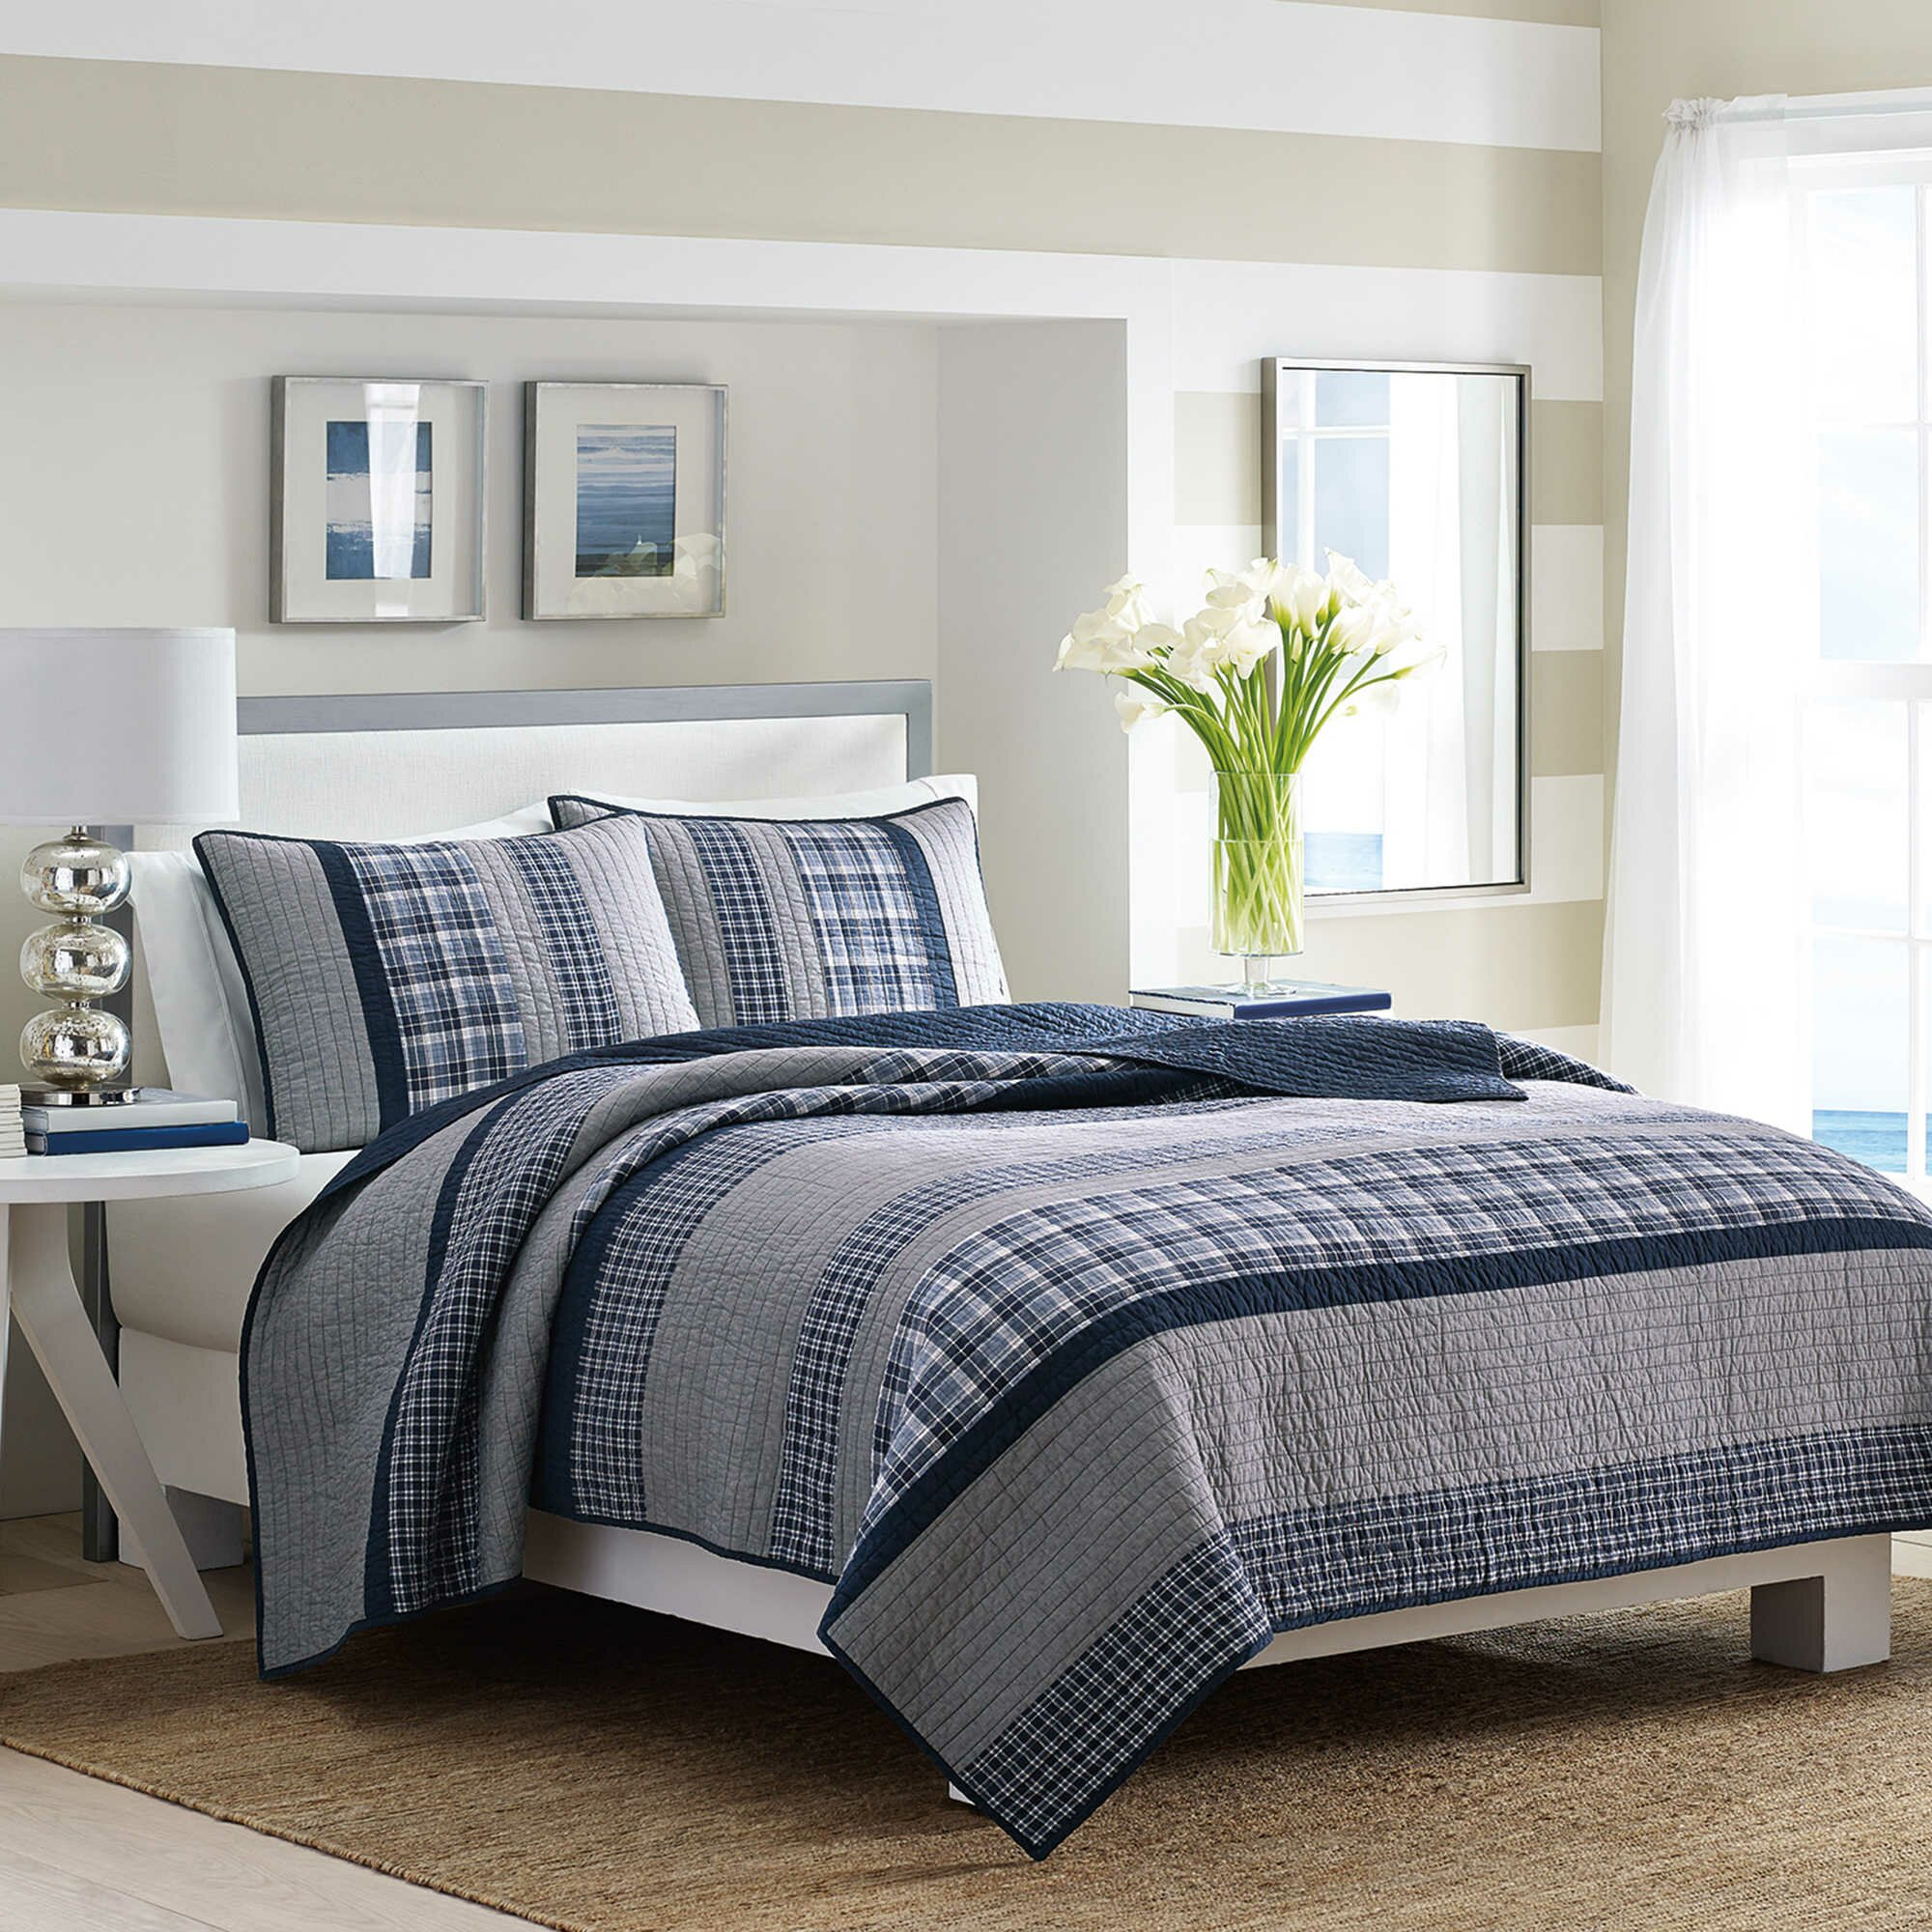 Nautica Bedroom Furniture Nautica Adleson Cotton Quilt Reviews Wayfair